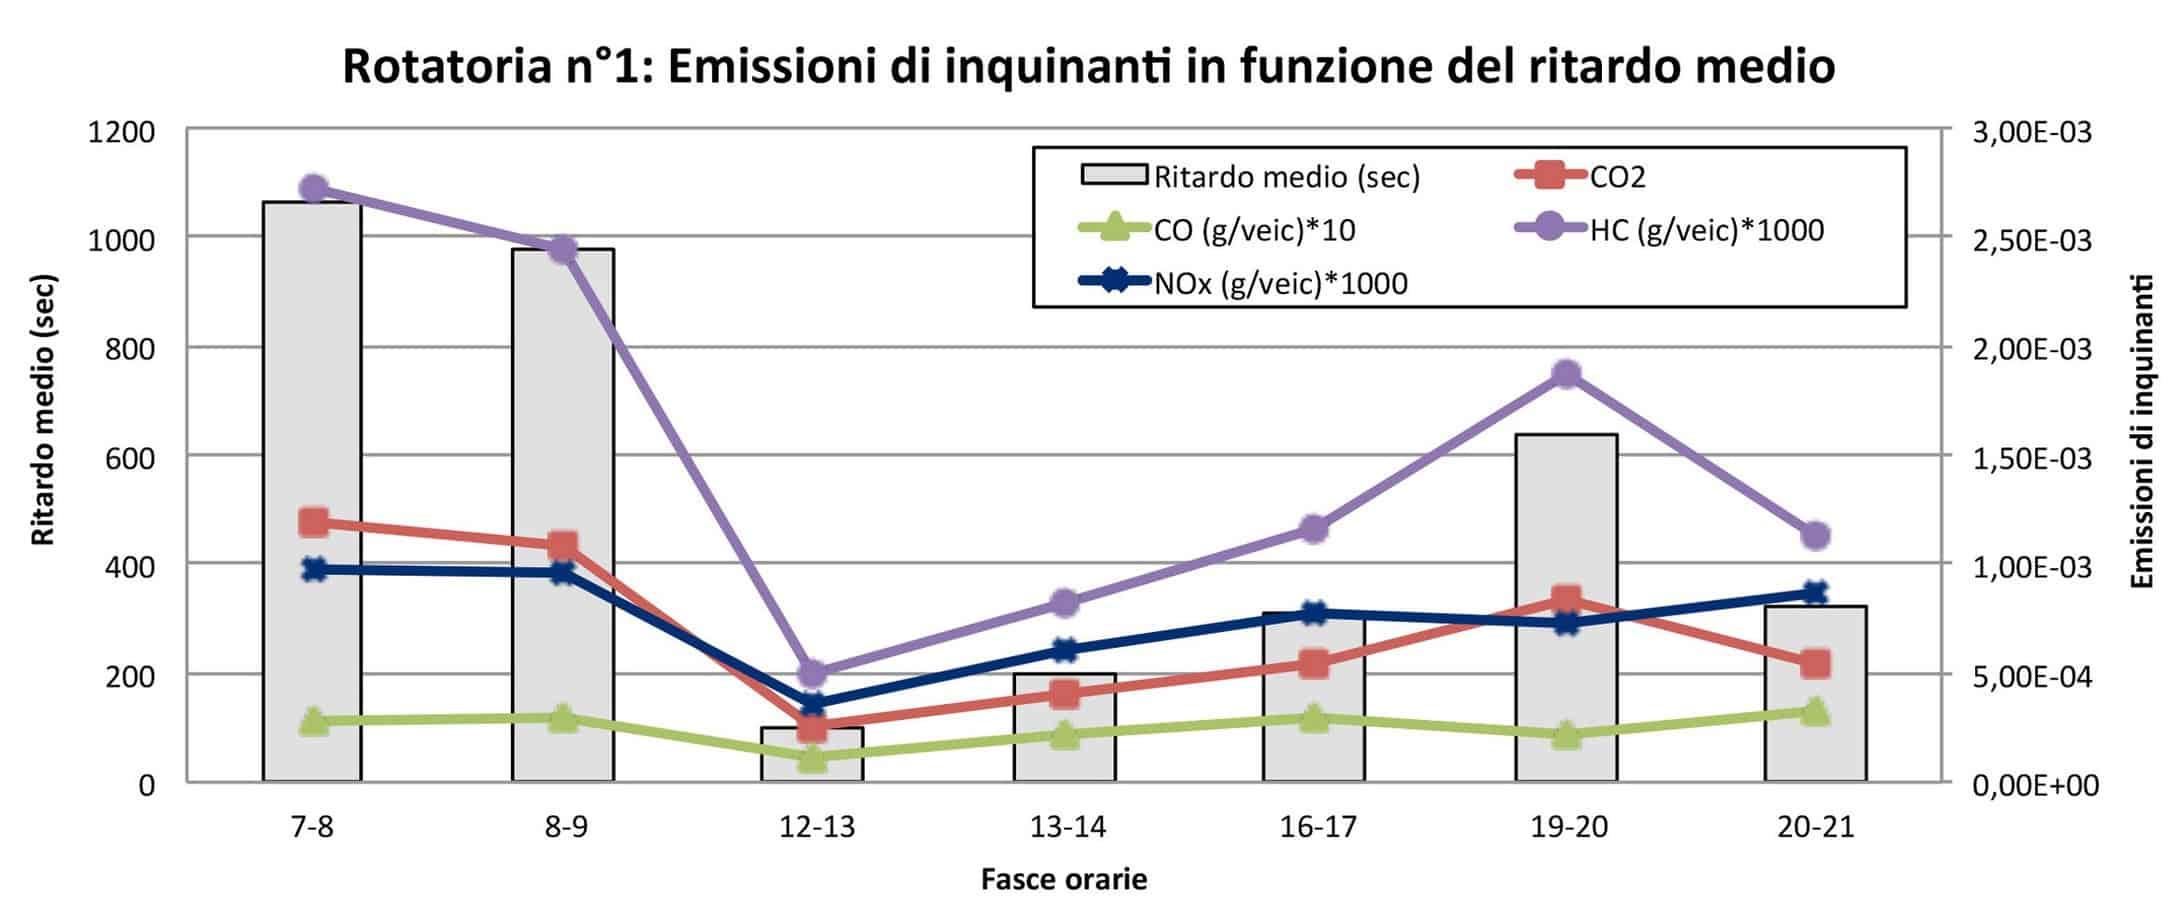 Le emissioni di inquinanti in funzione del ritardo medio (rotatoria n° 1)